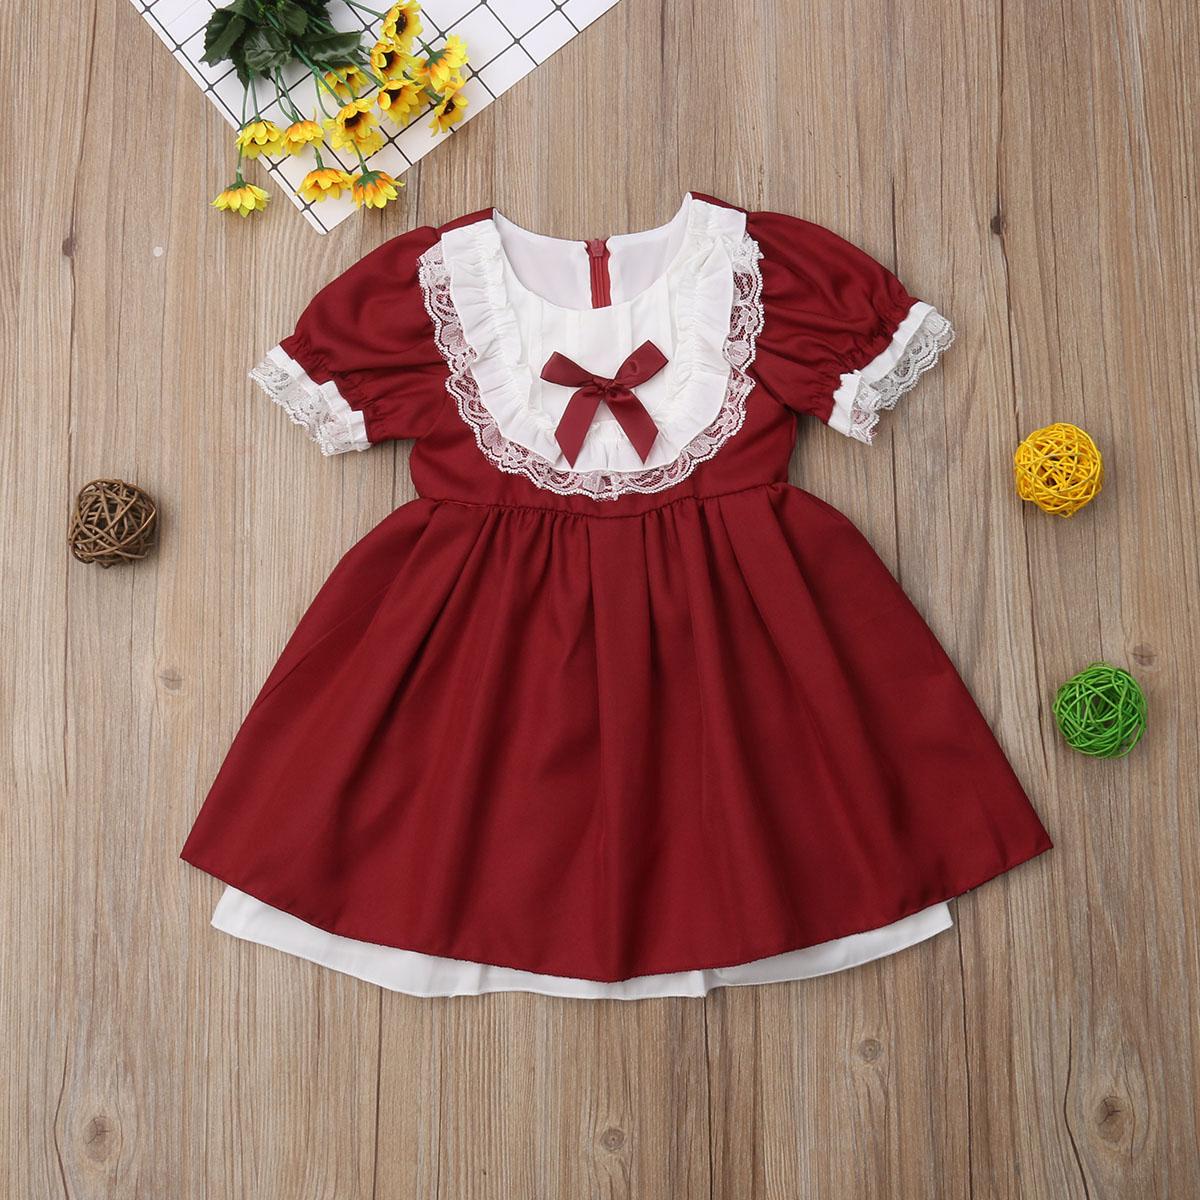 UK Xmas Newborn Kids Baby Girls Party Romper Tulle Dress Princess Clothes Set